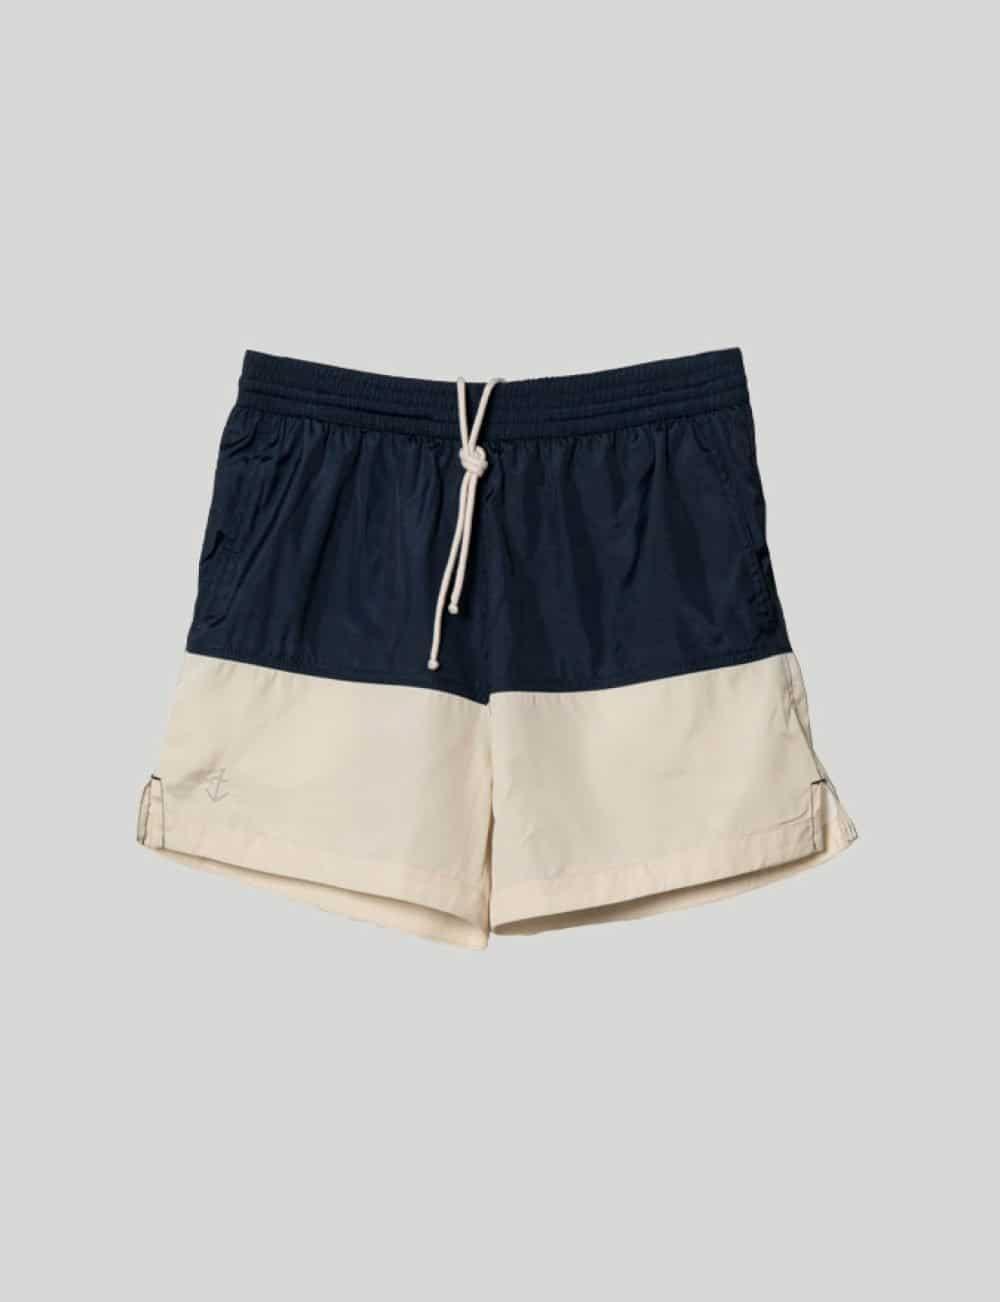 Castart - La Paz - Morais Swim Shorts - Ecru & Navy